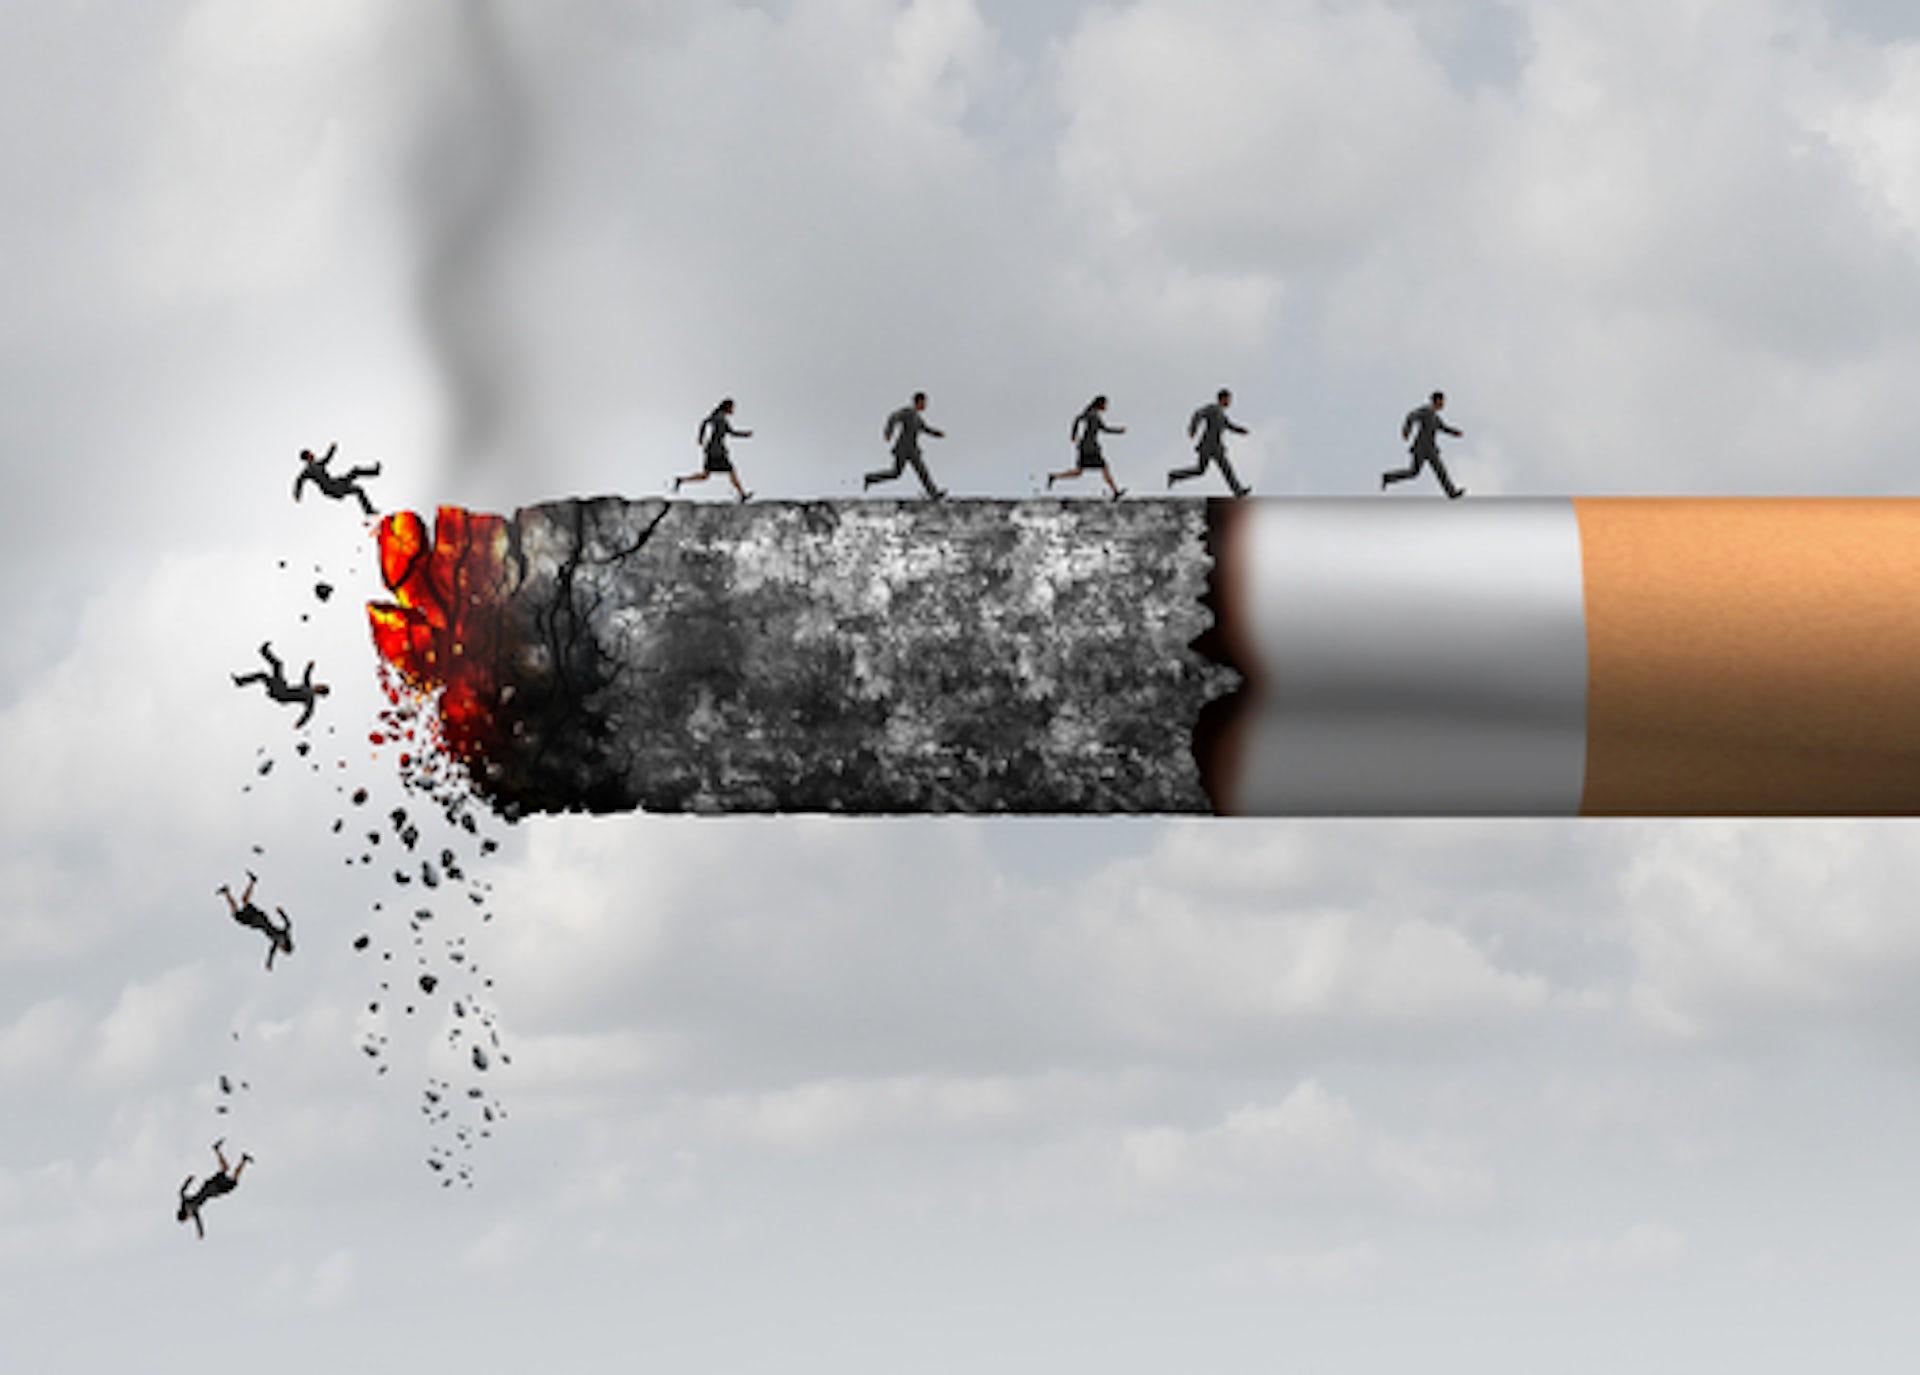 smoking death statistics